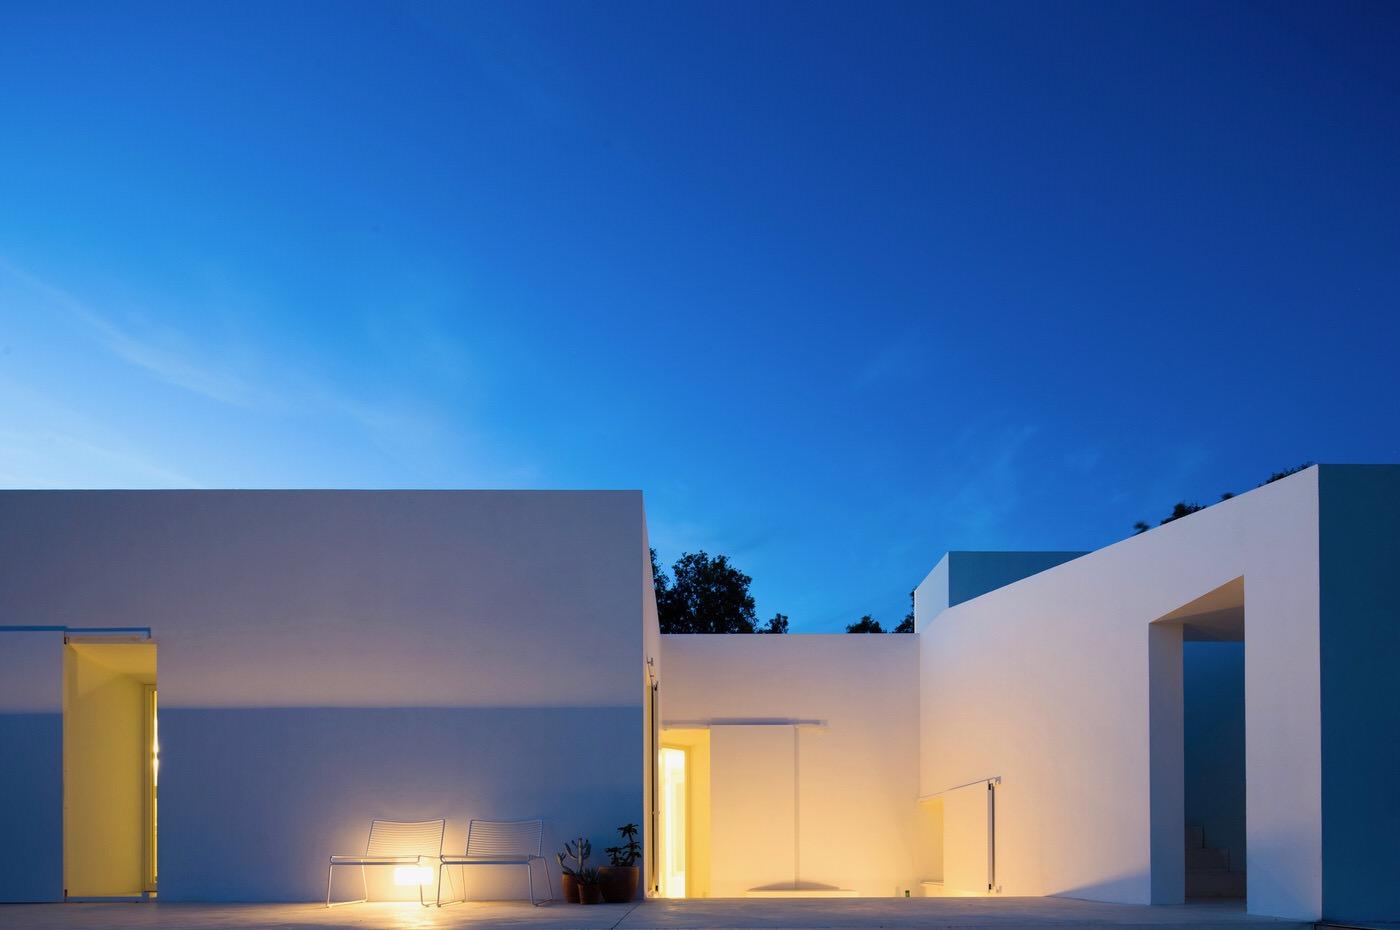 Zalig-Algarve-Casa-Luum-228-1